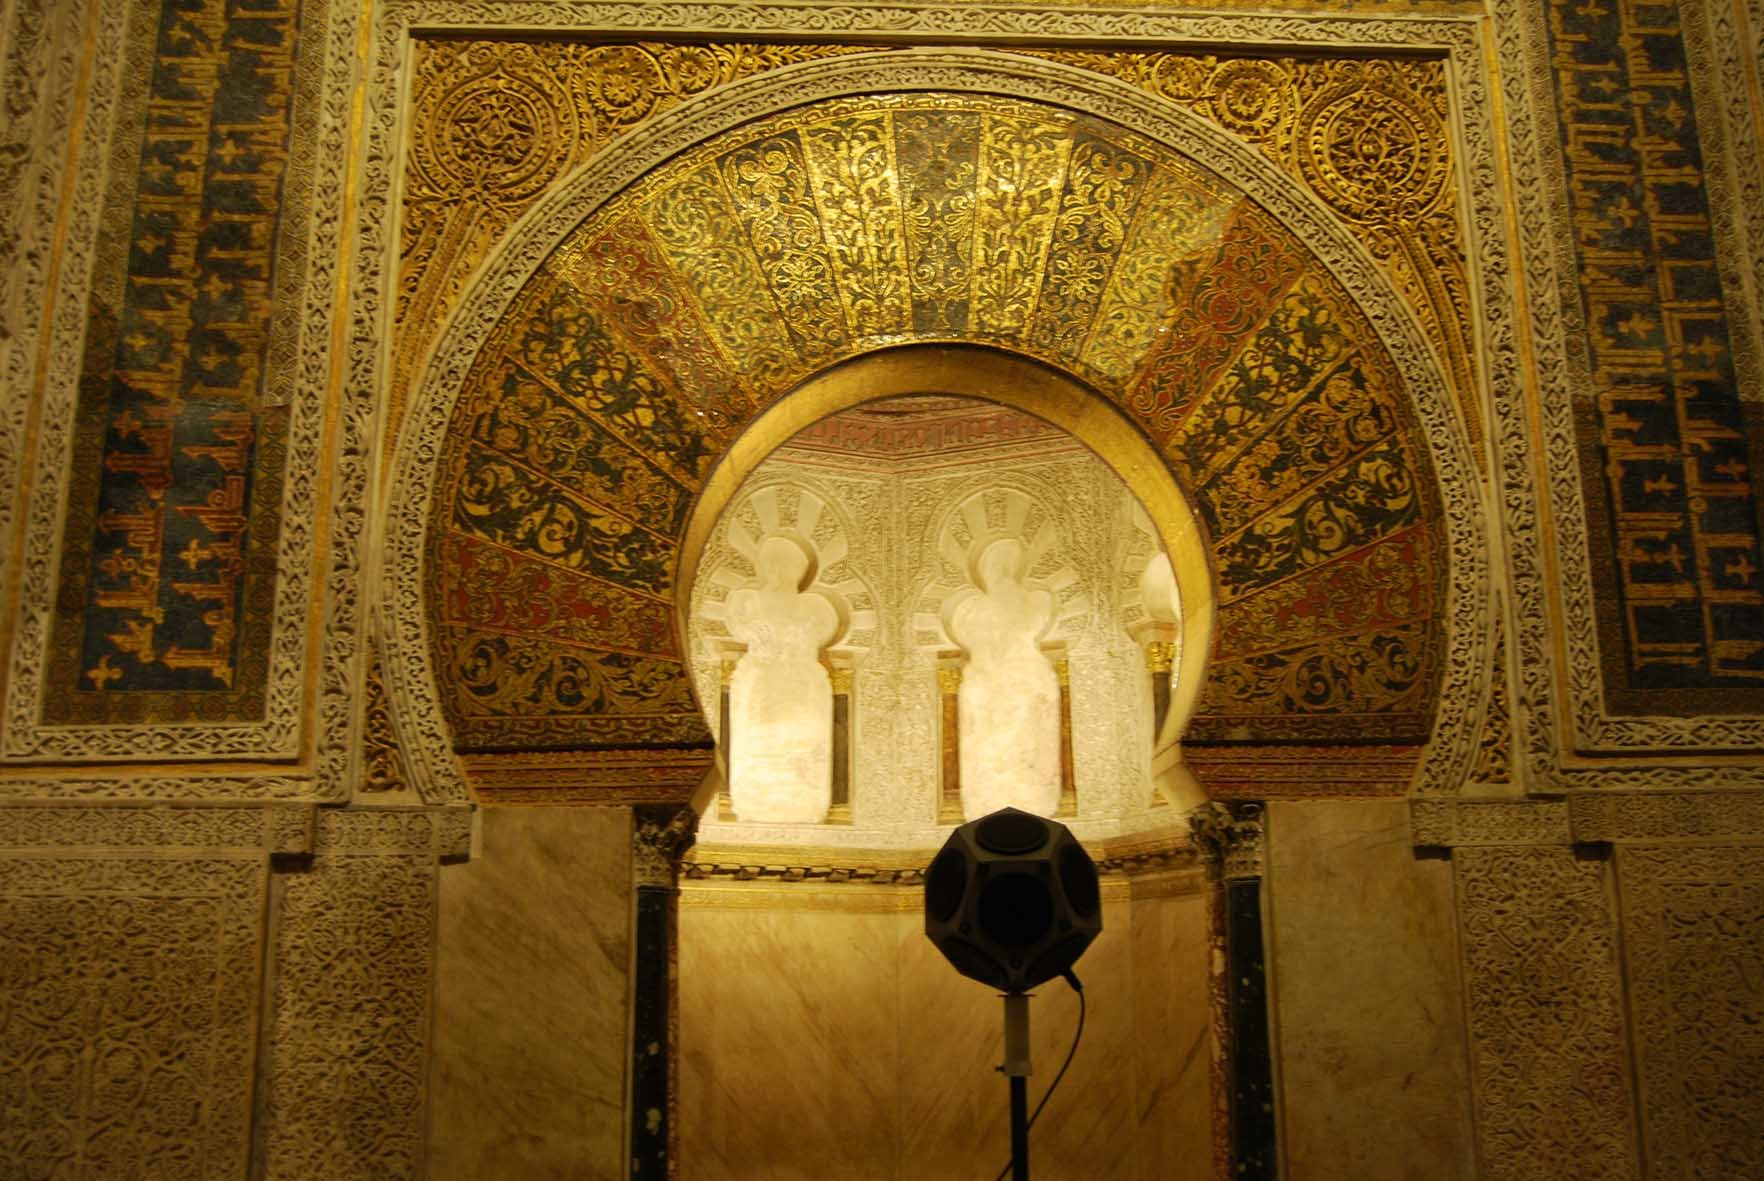 Cordoba Mosque آیا صوفیا، مسجد قرطبہ، بابری مسجد، اسلام آباد کے مندر کی فکری و فقہی اقلیدس